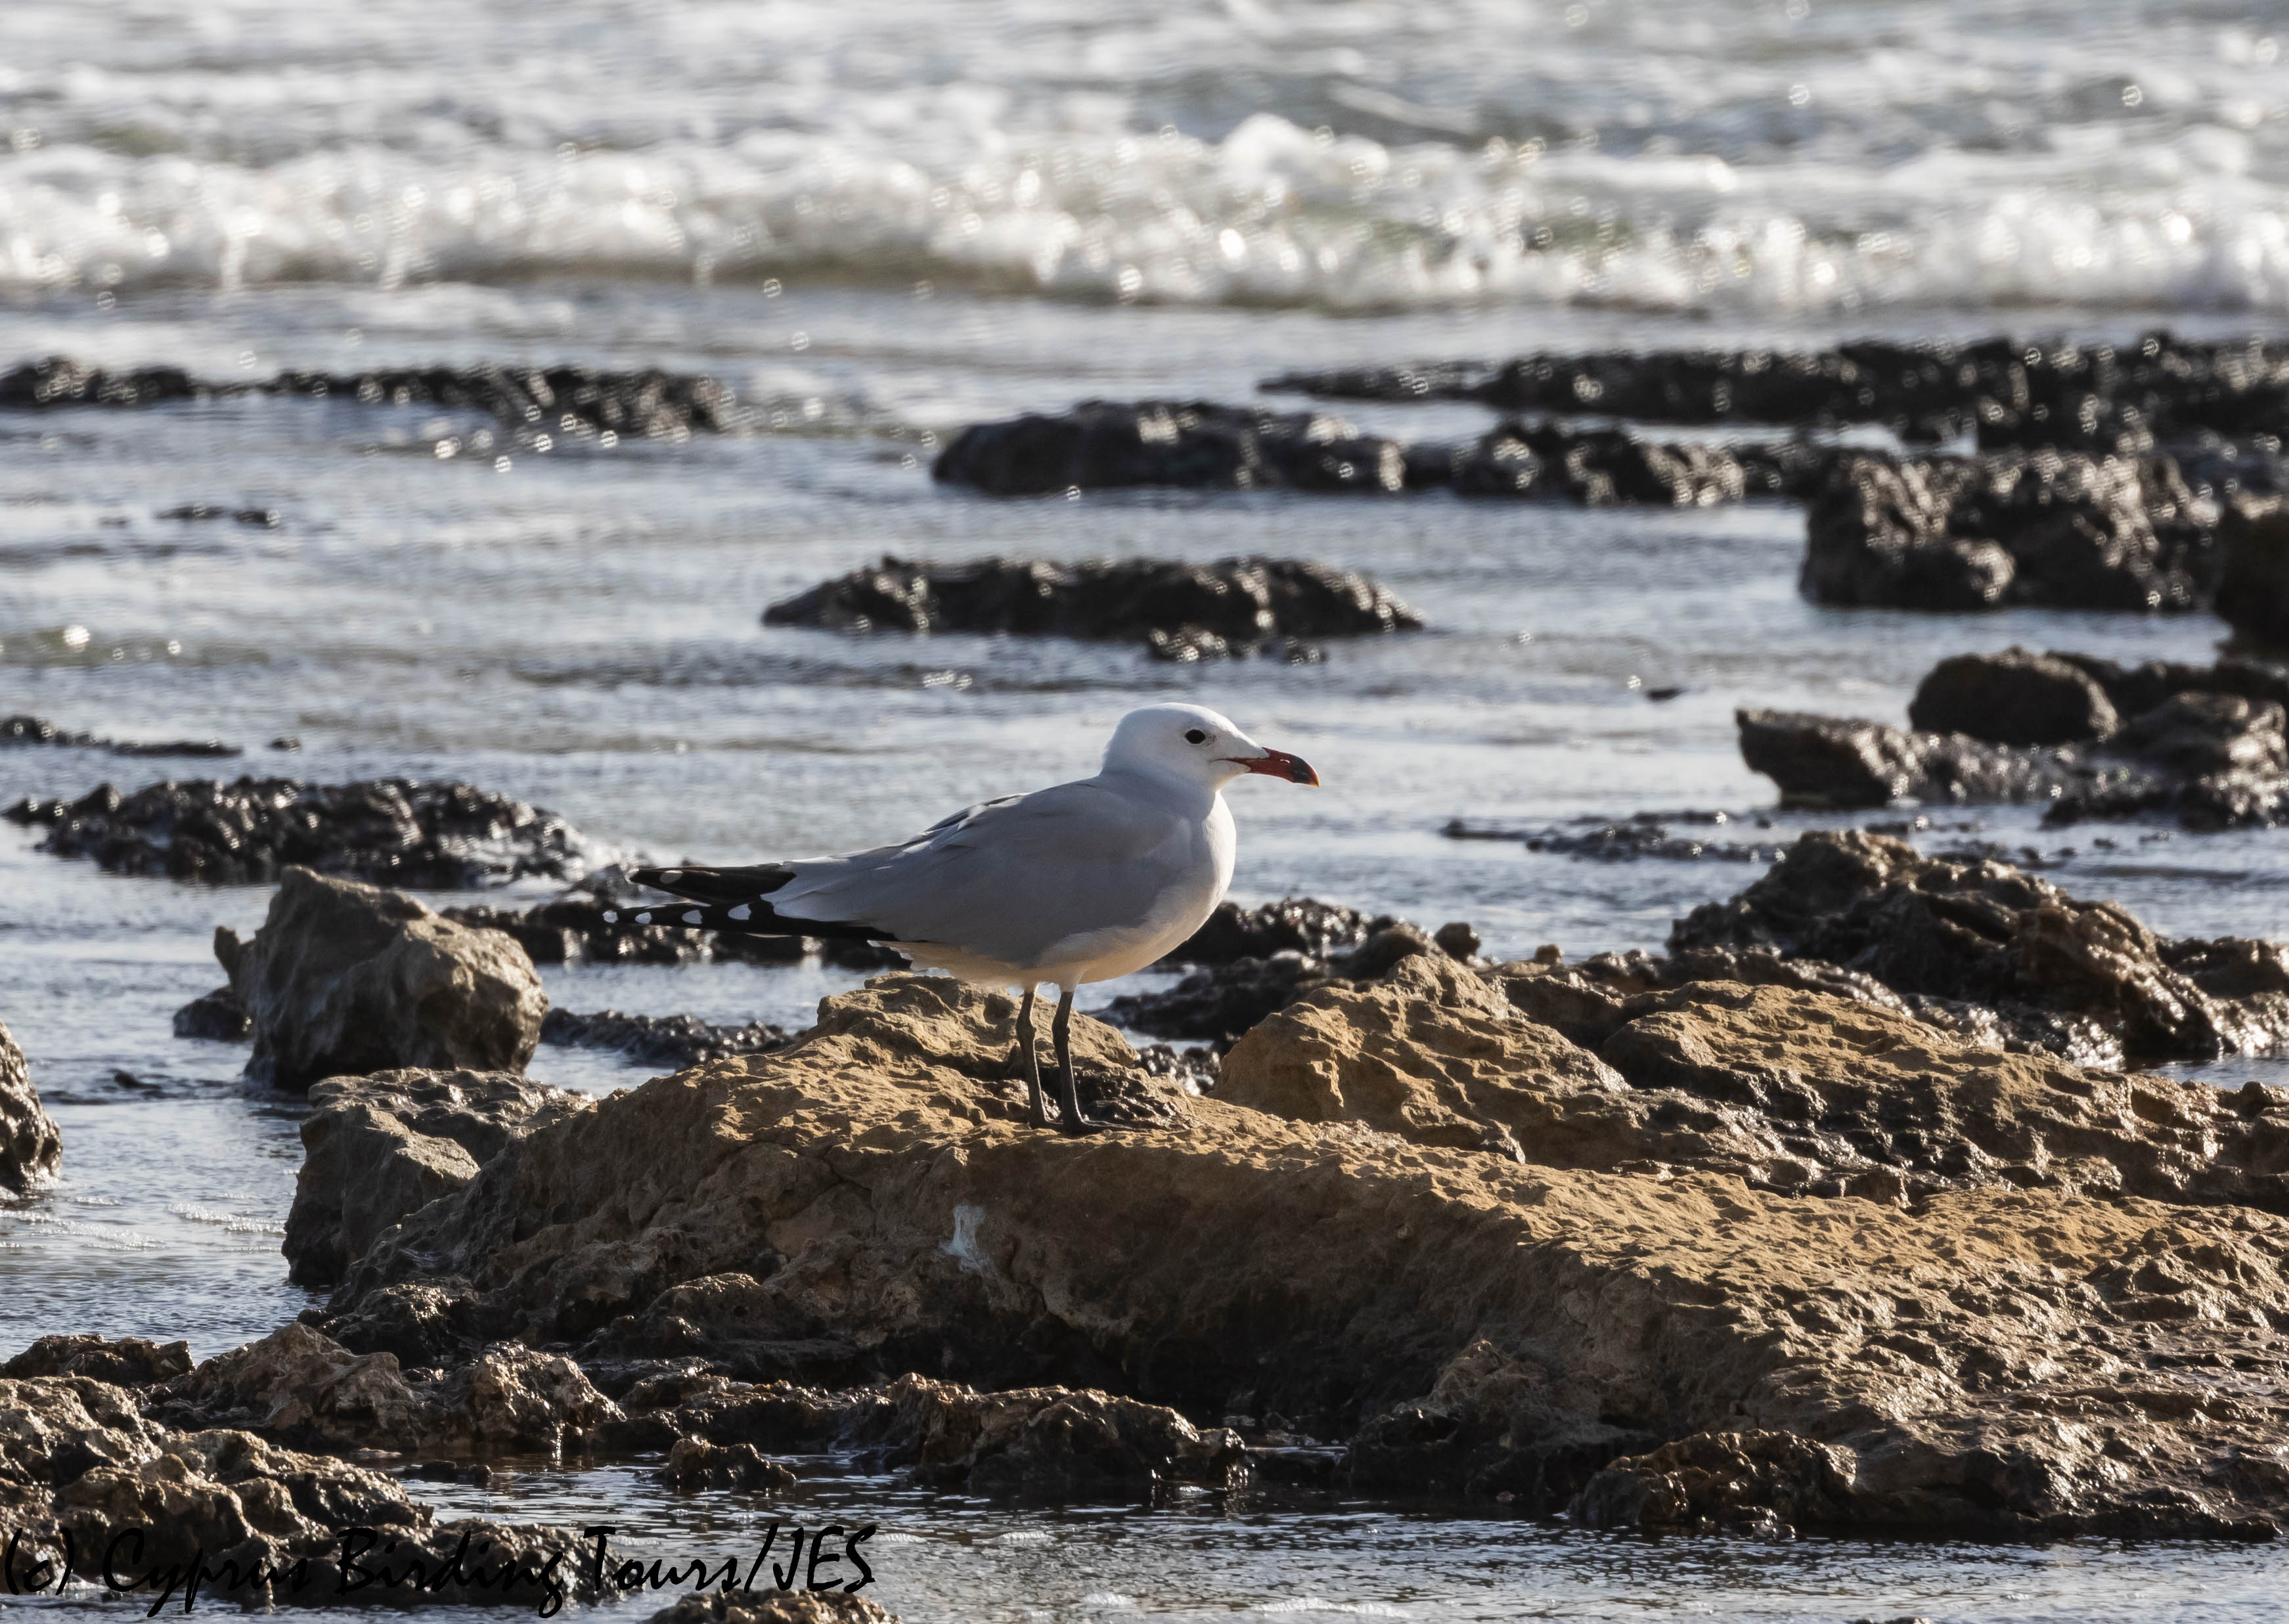 Audouin's Gull, Kermia Beach 11th December 2018 (c) Cyprus Birding Tours